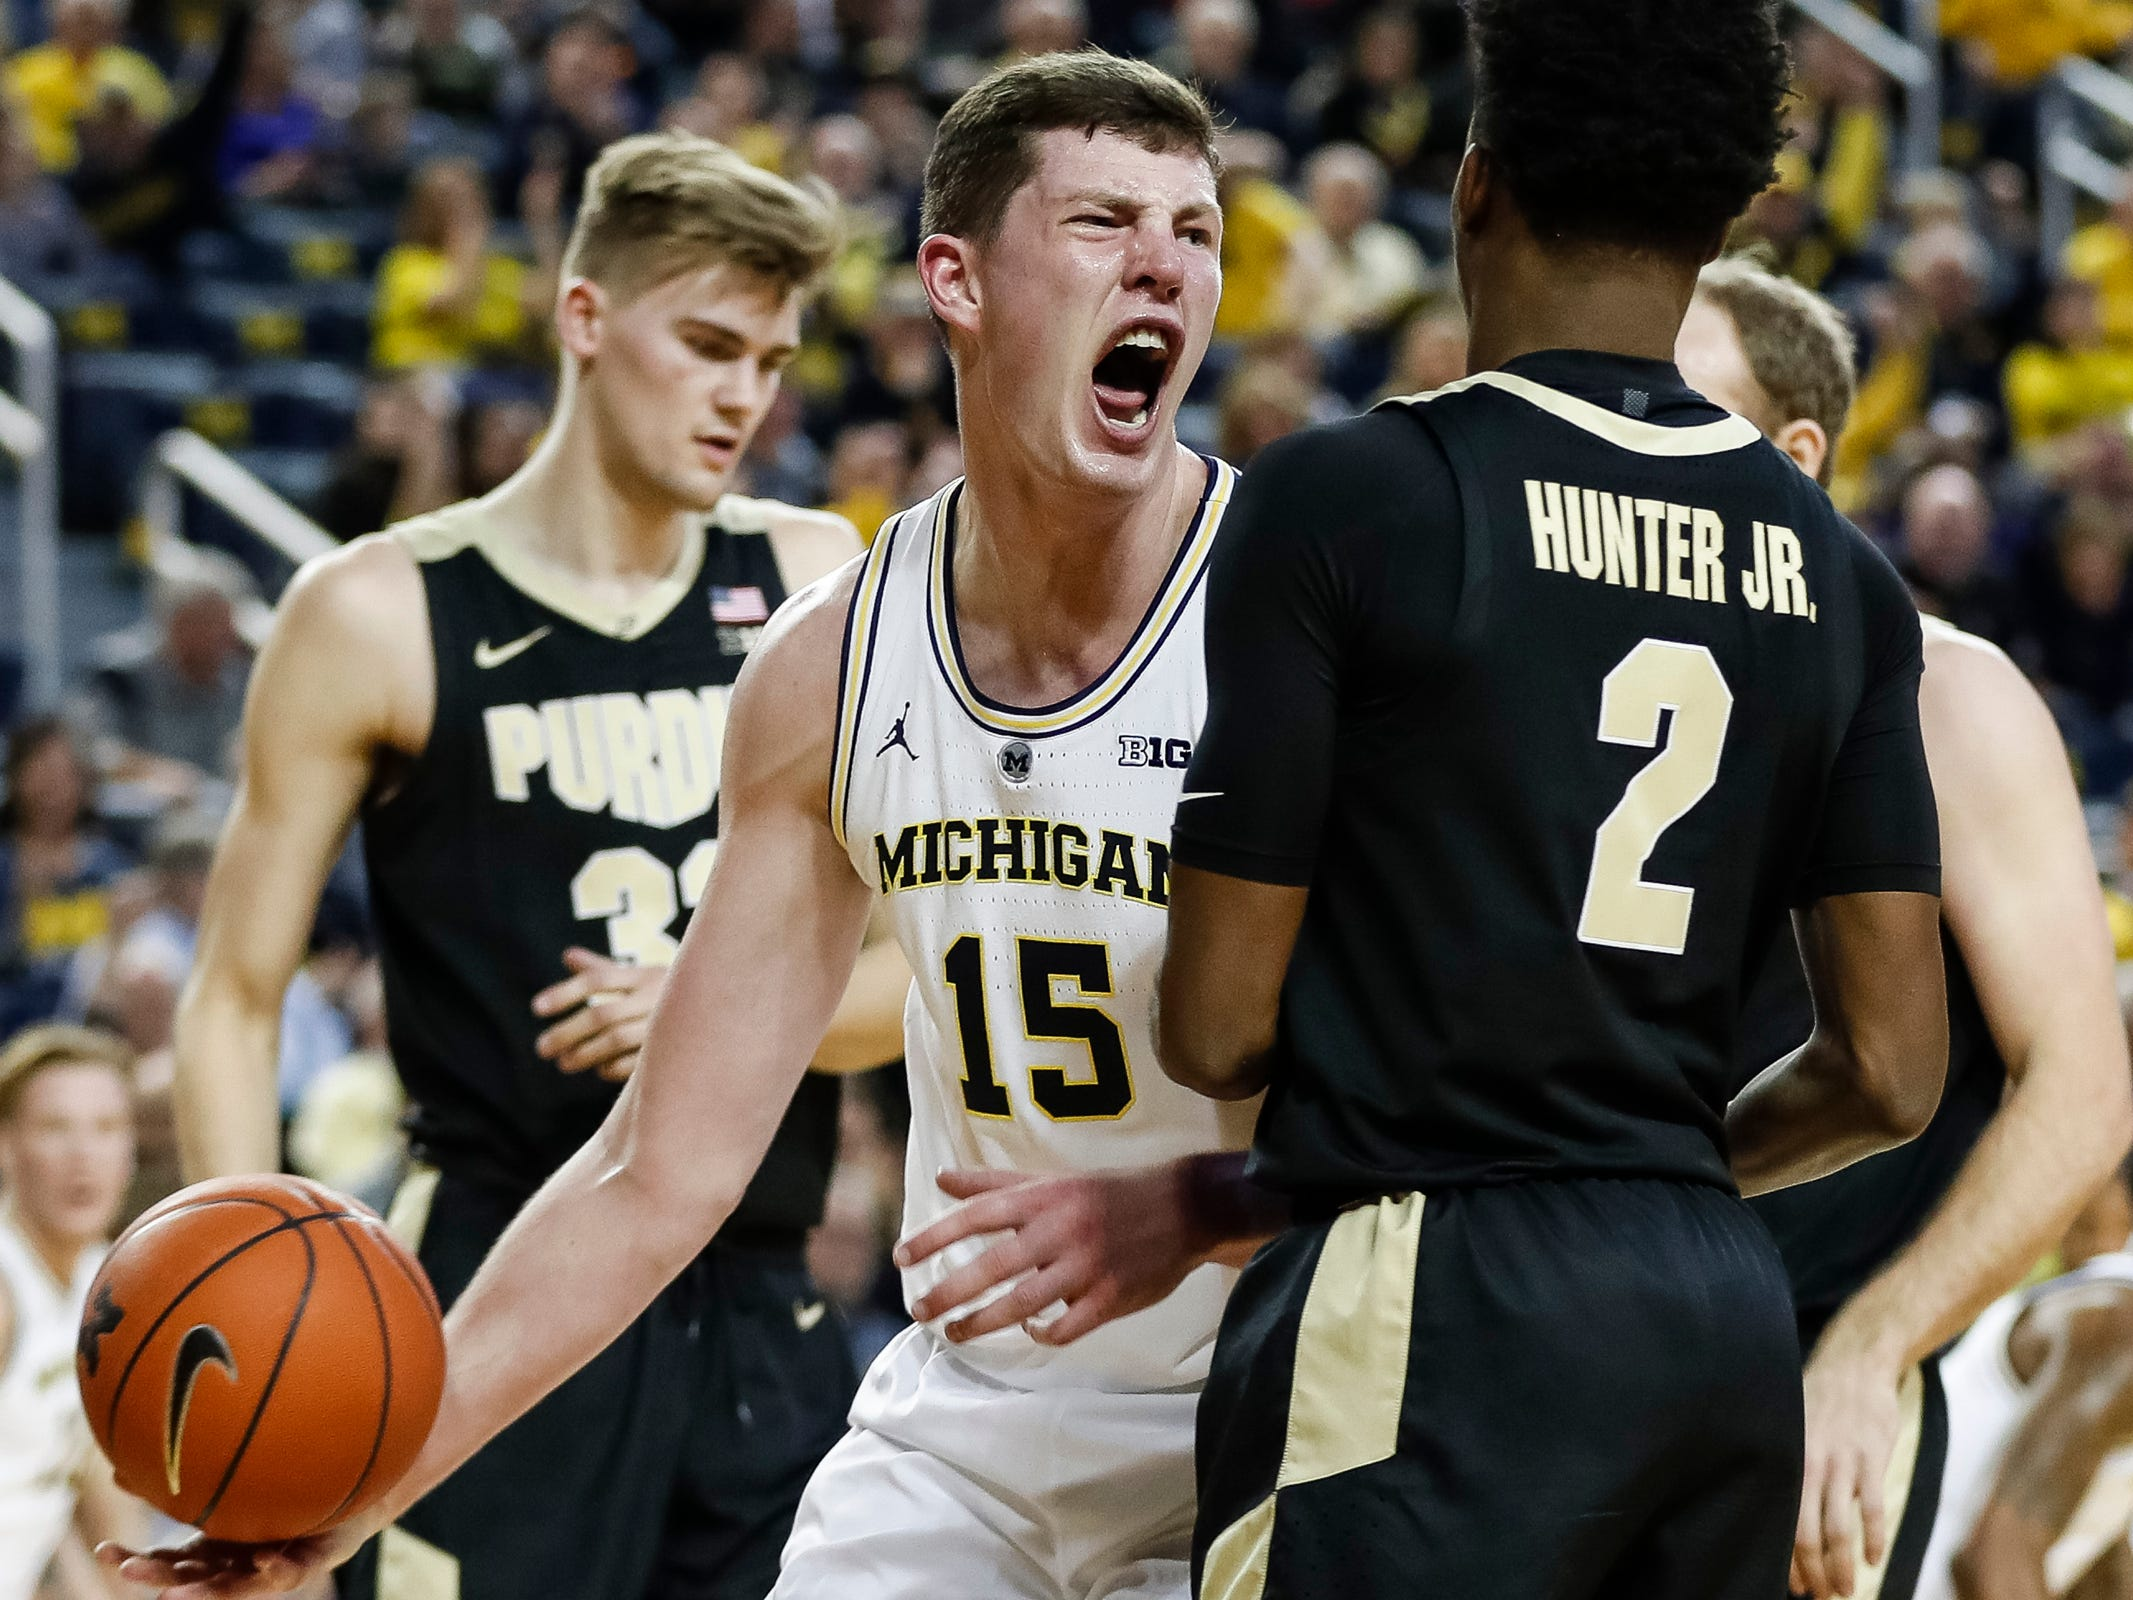 Michigan center Jon Teske (15) celebrates a dunk during the first half against Purdue at Crisler Center on Saturday, Dec. 1, 2018.